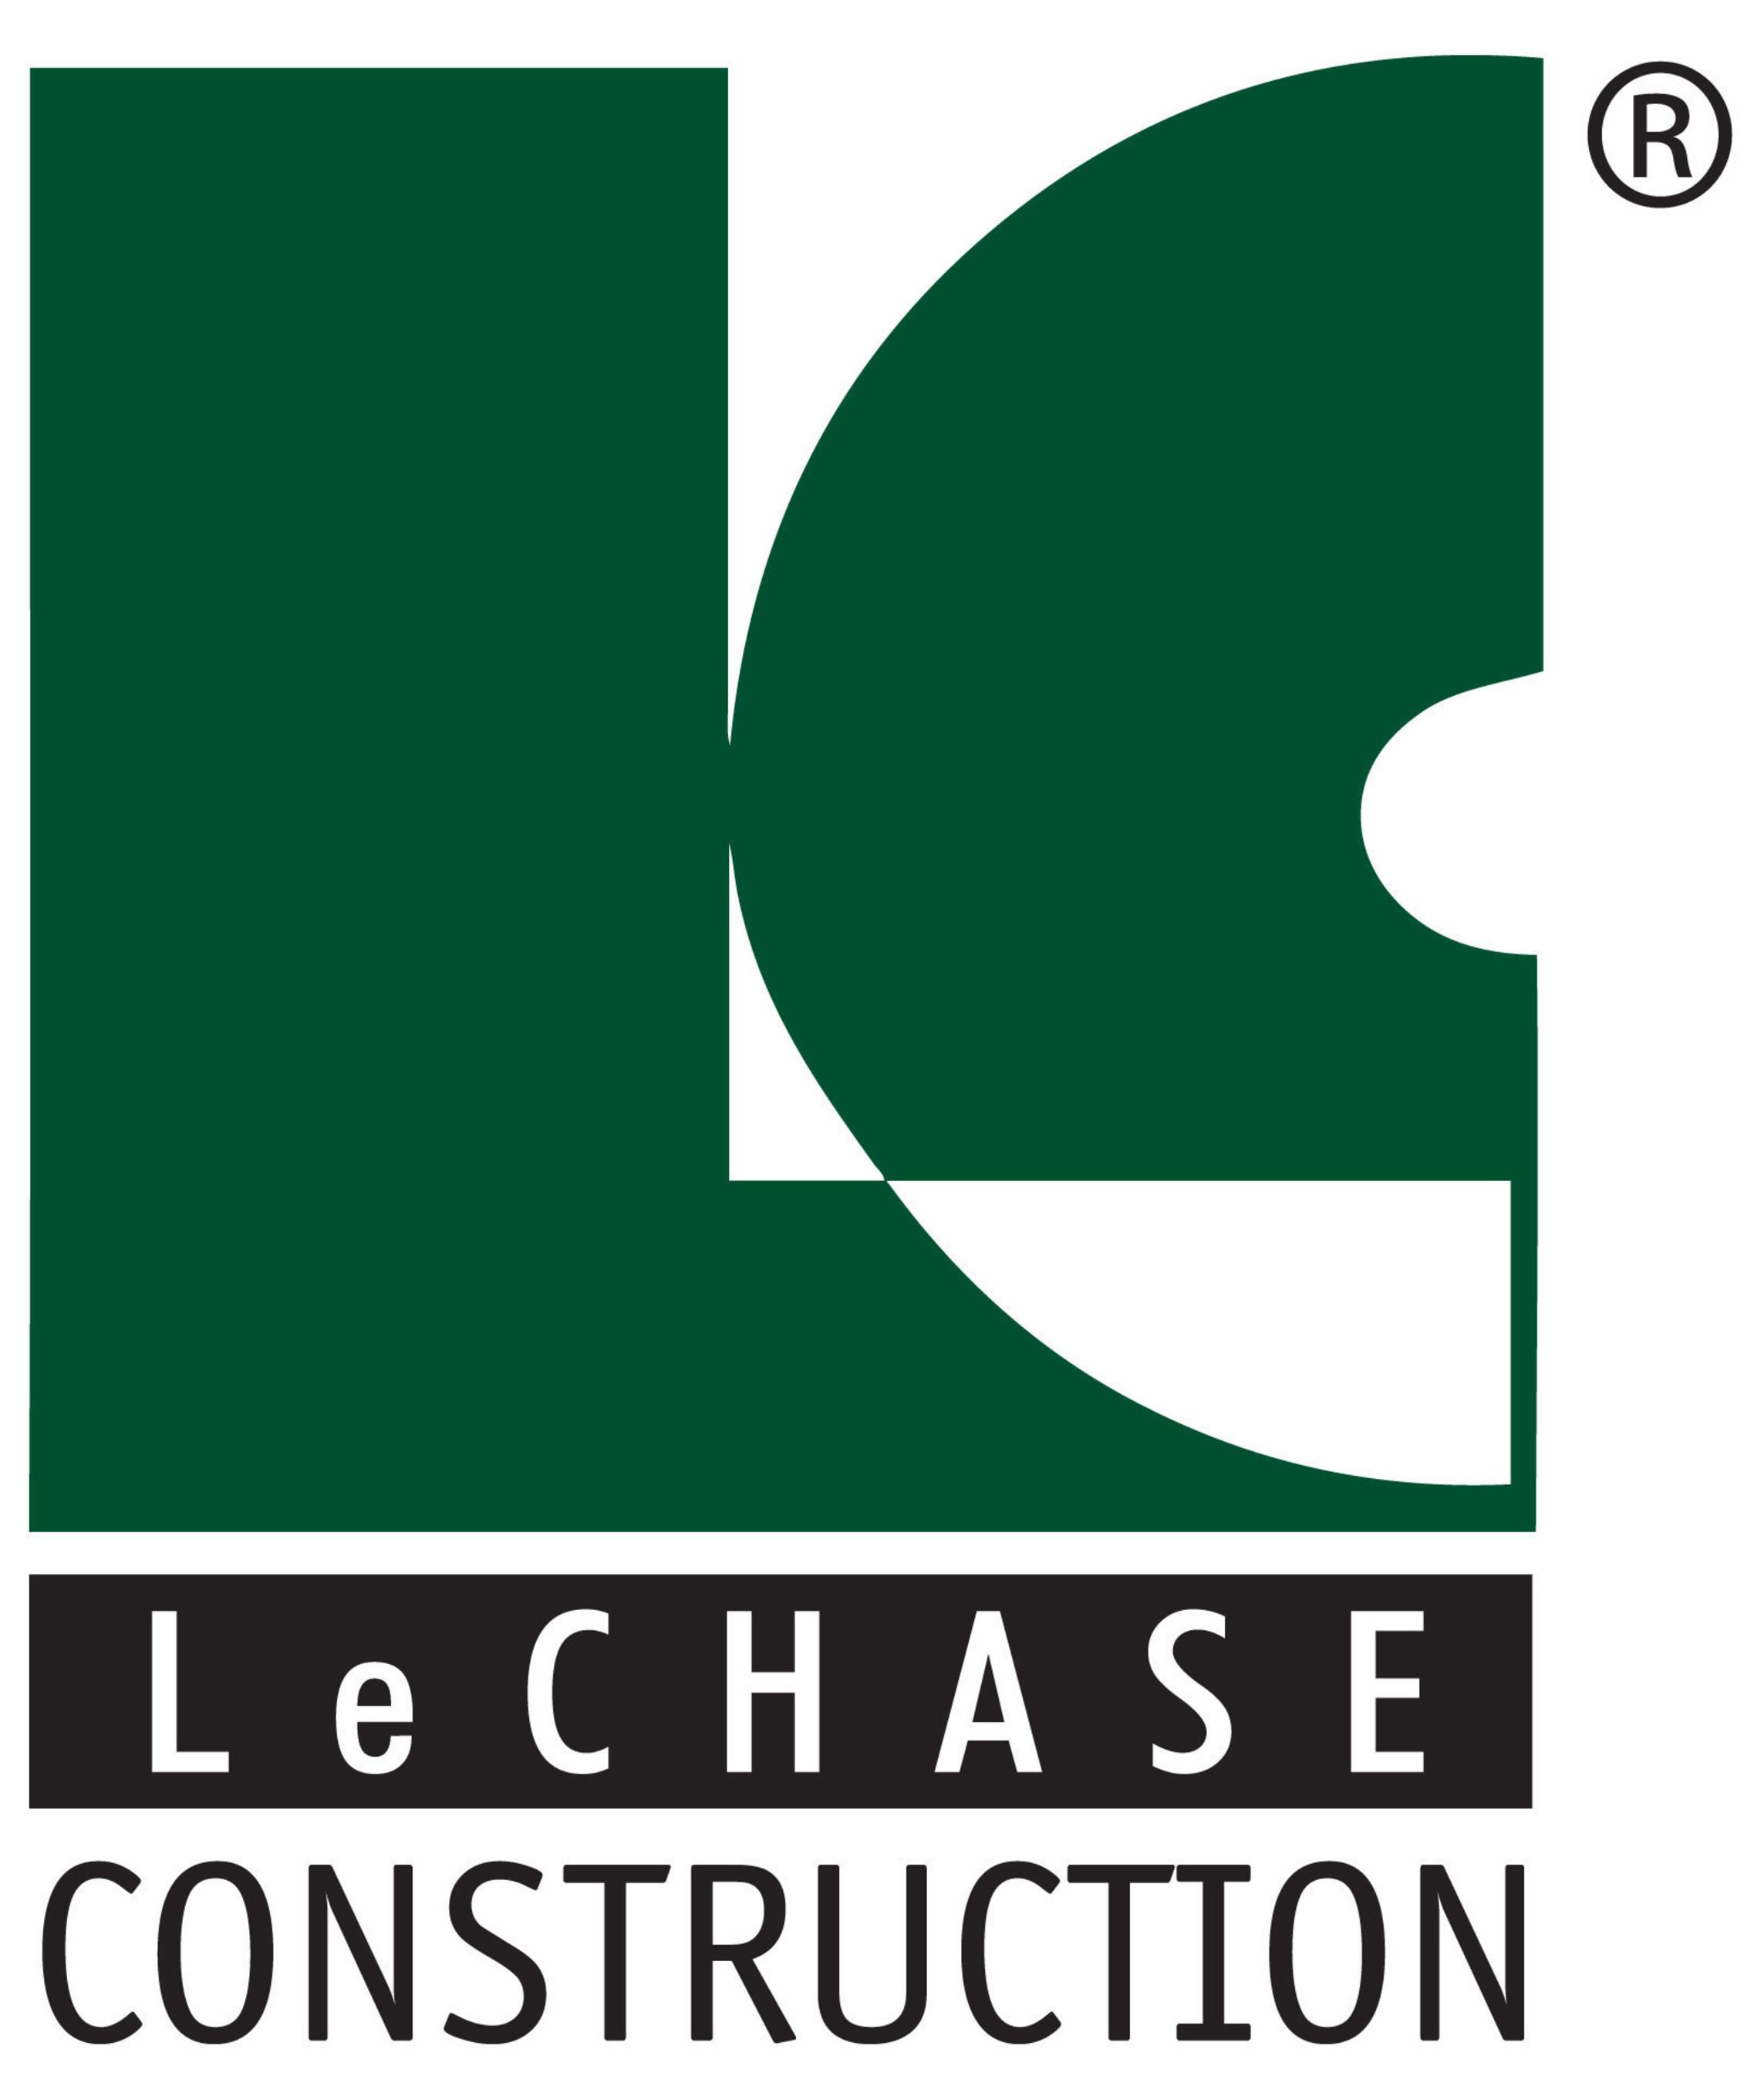 LeChase Construction Services, LLC logo.